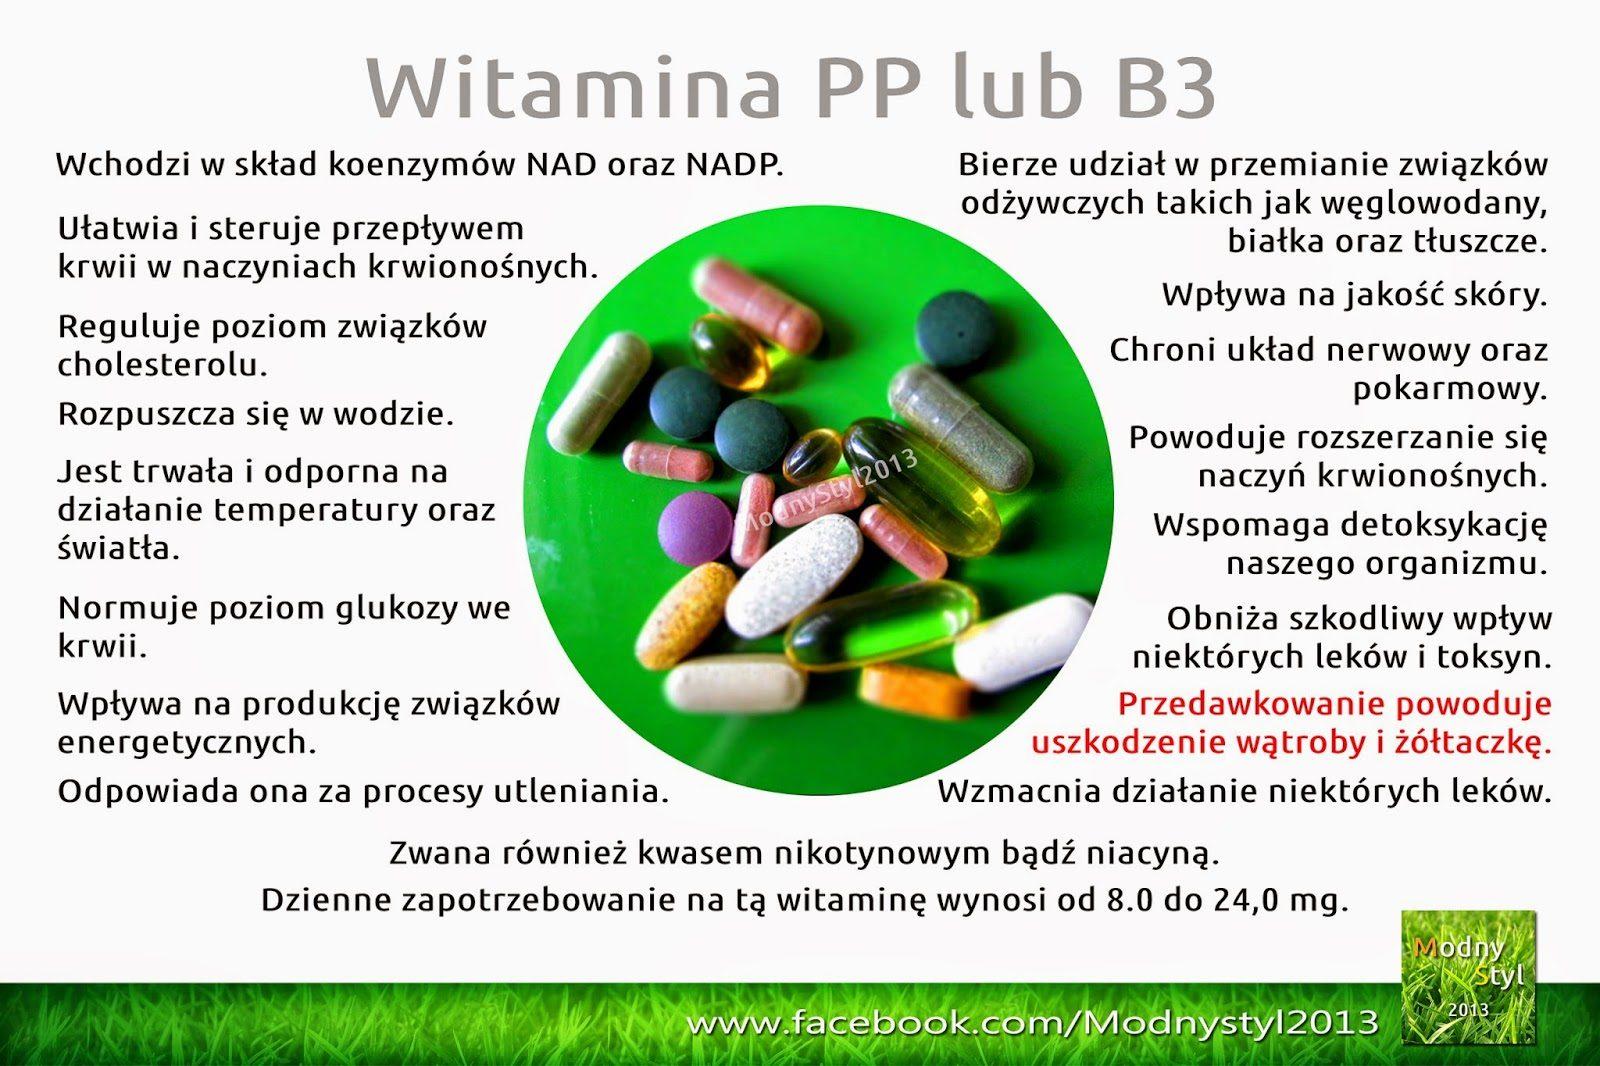 witamina2bpp-4538400